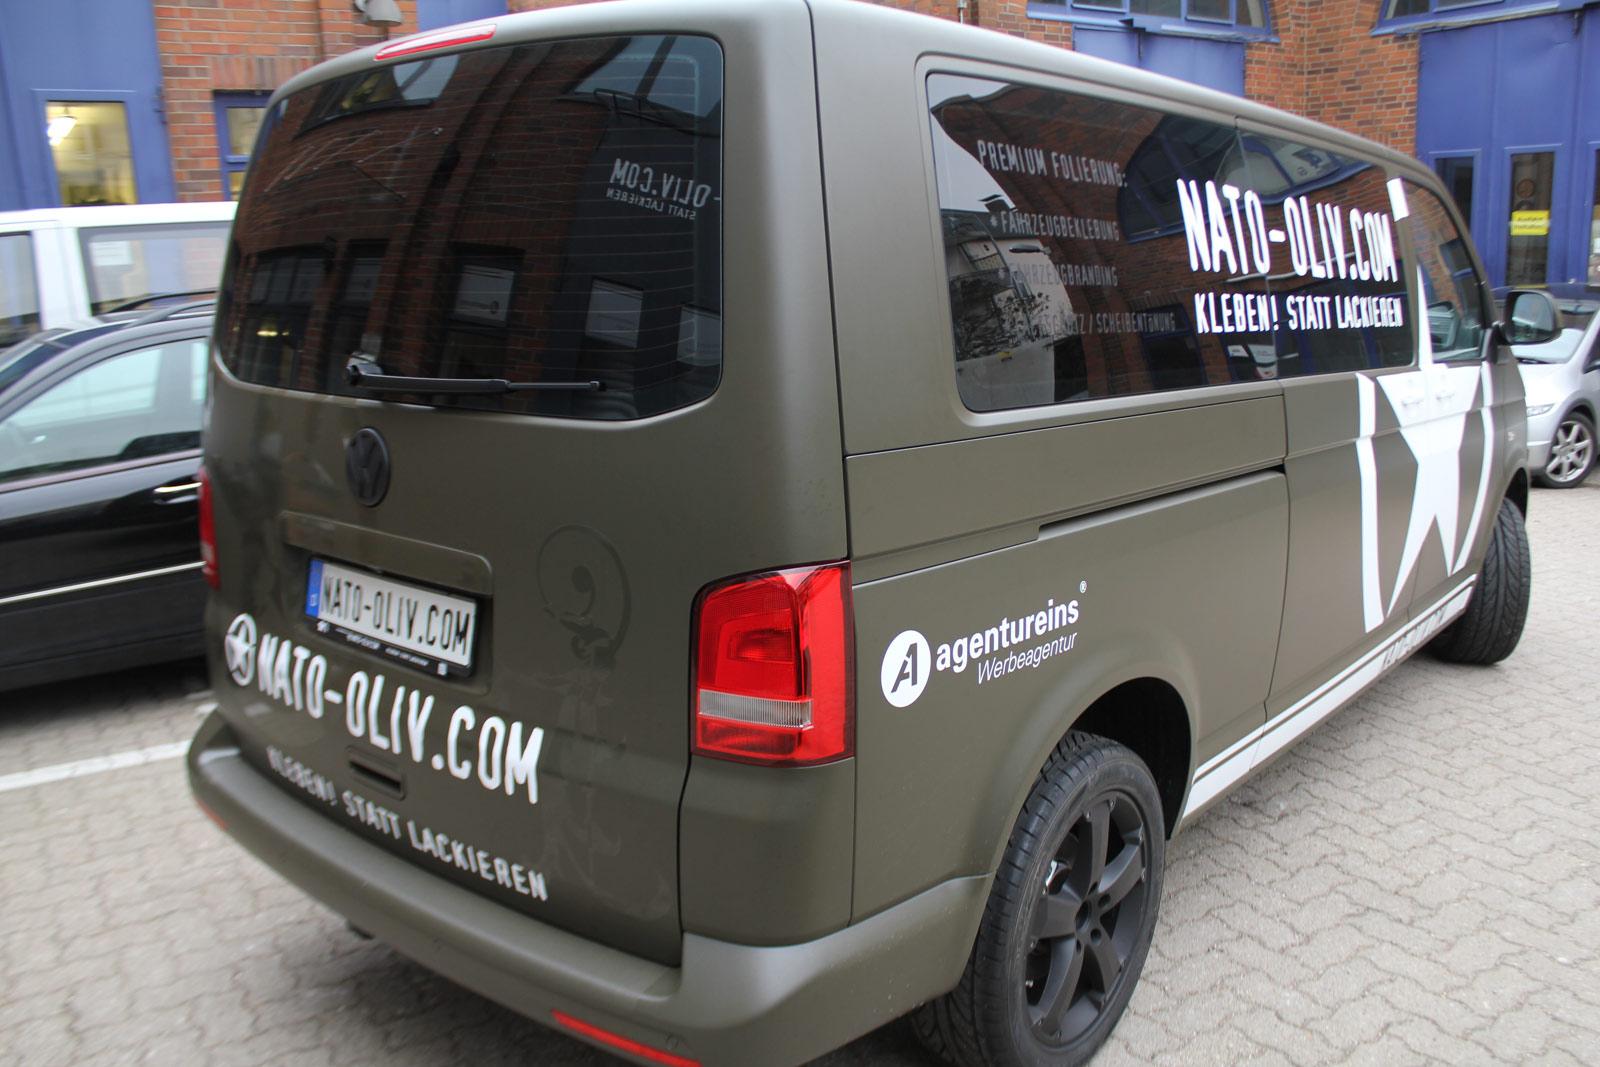 VW_T5_VOLLFOLIERUNG_NATO-OLIV_10